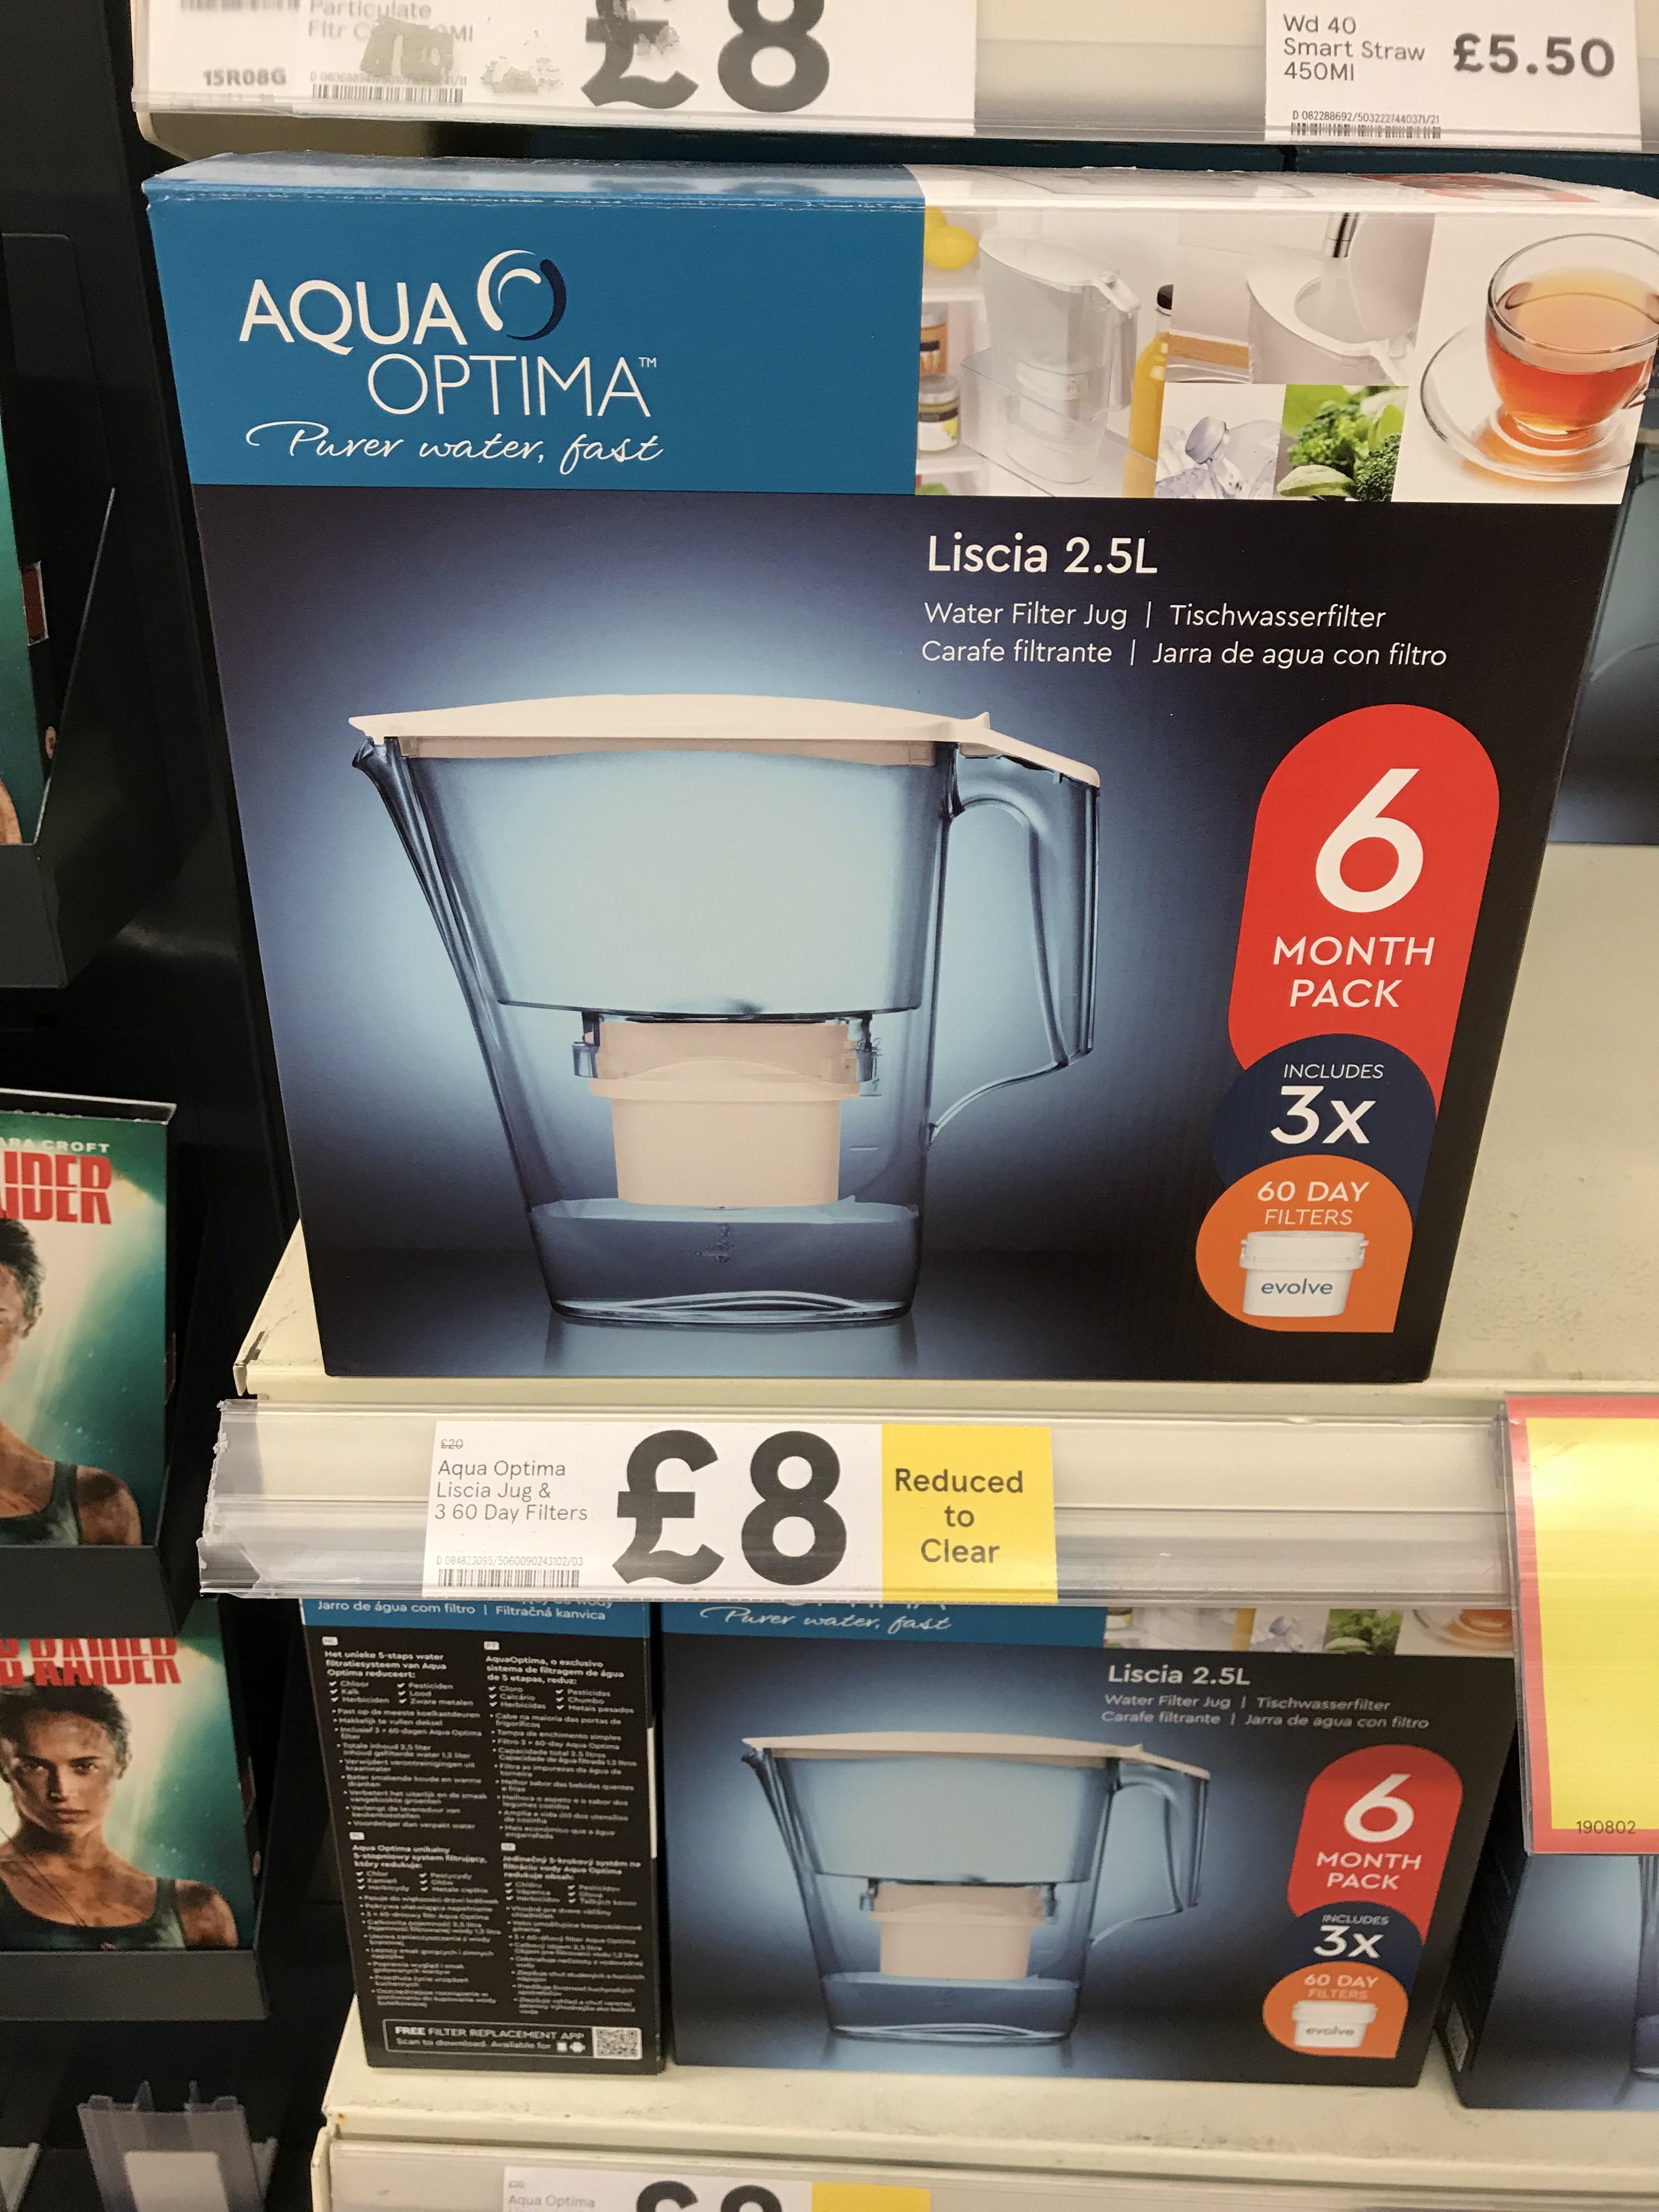 Aqua optima instore at Tesco for £8